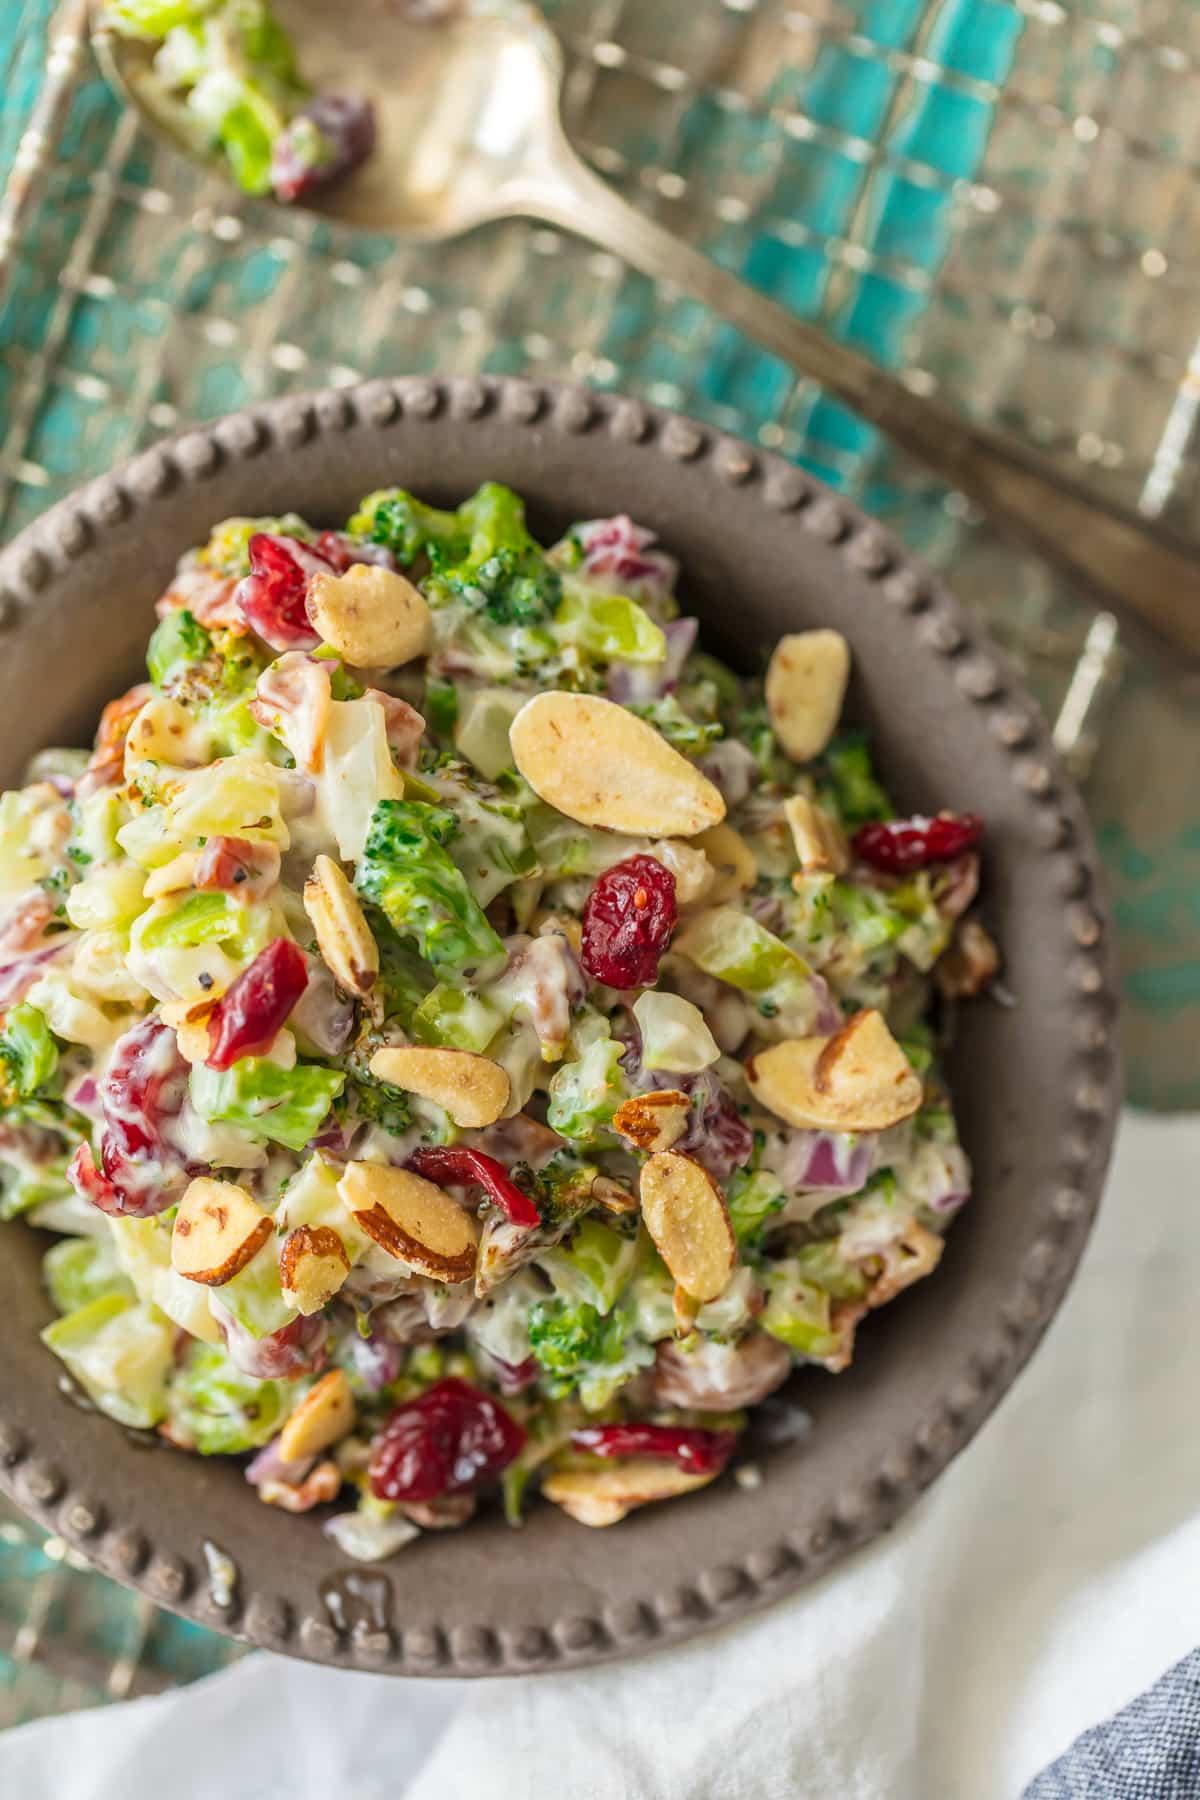 Charred broccoli cranberry salad